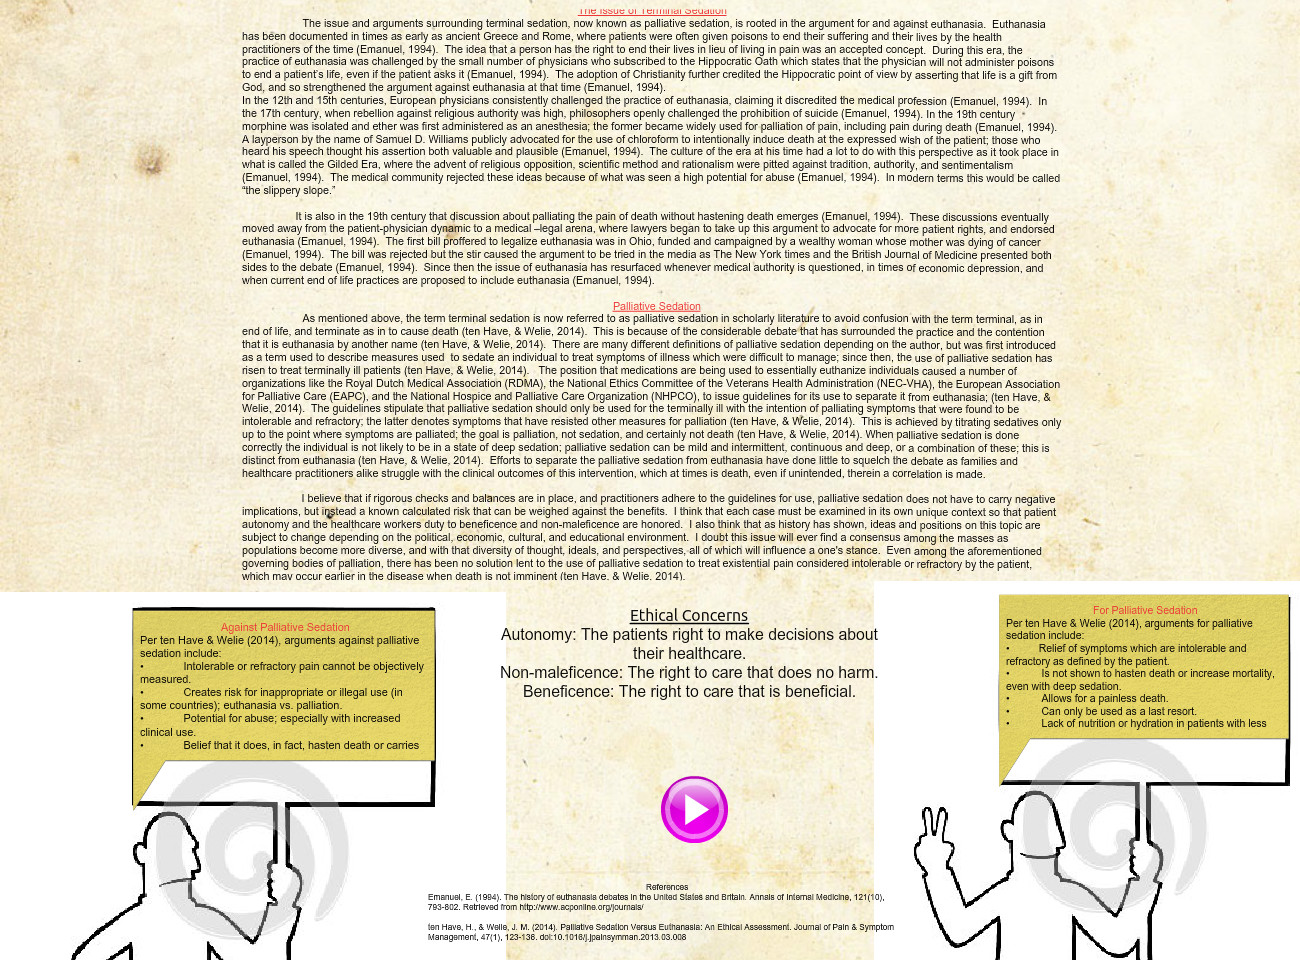 Terminal sedation clipart clip art library download Terminal Sedation Shatika James: text, images, music, video ... clip art library download